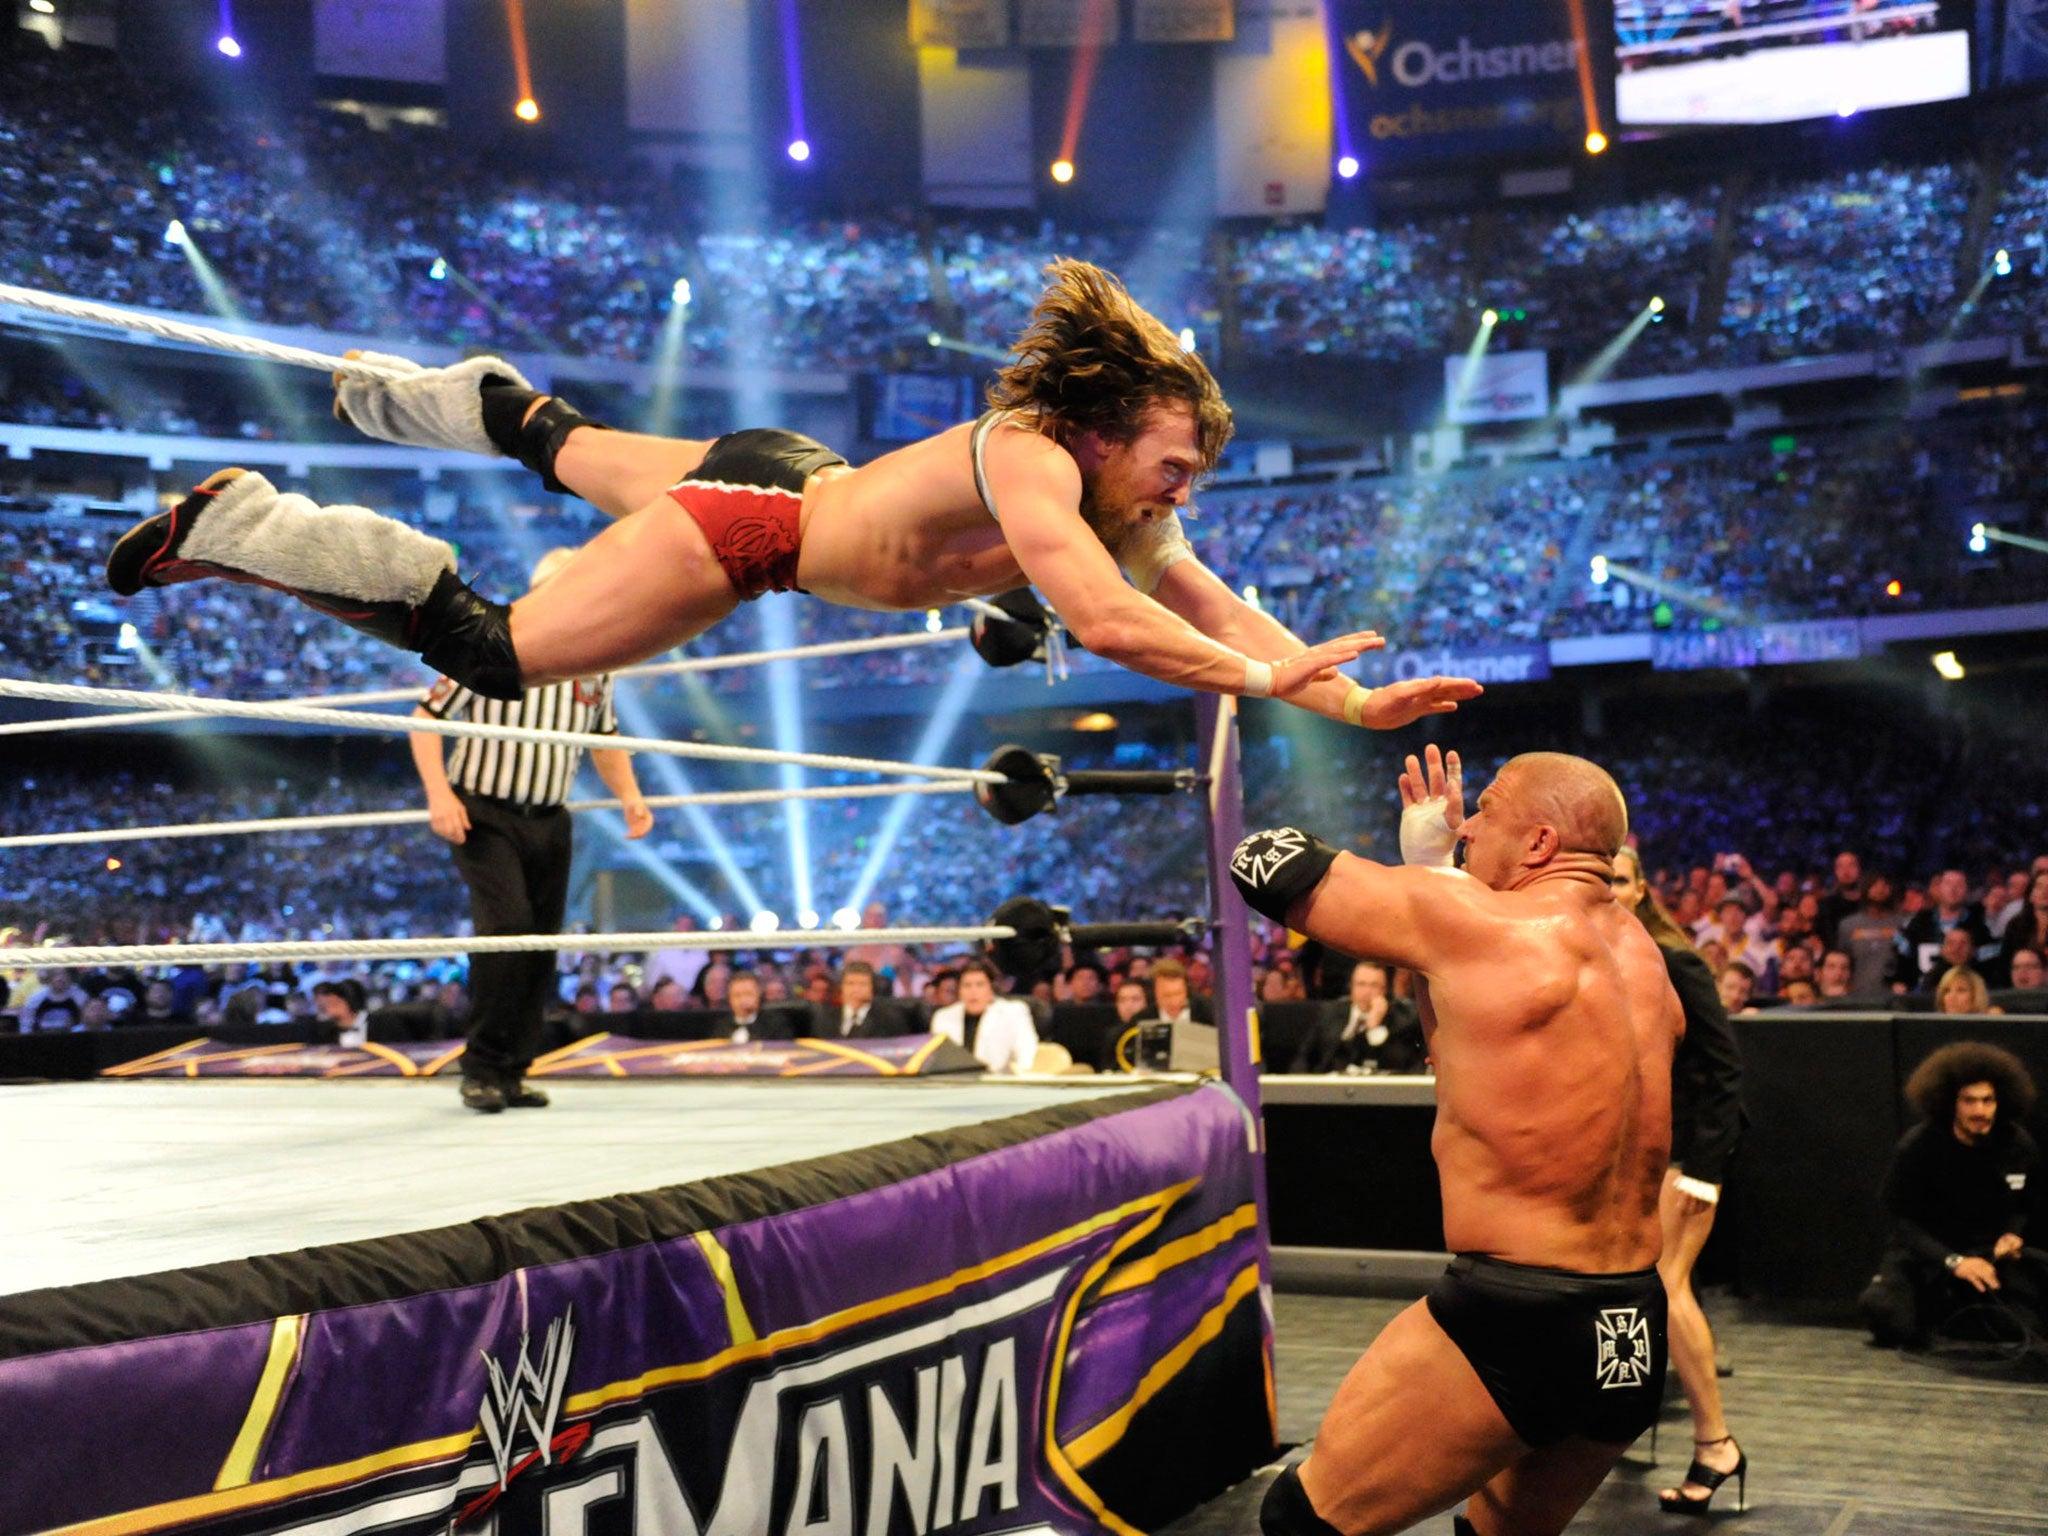 Benefits of dating a wrestler